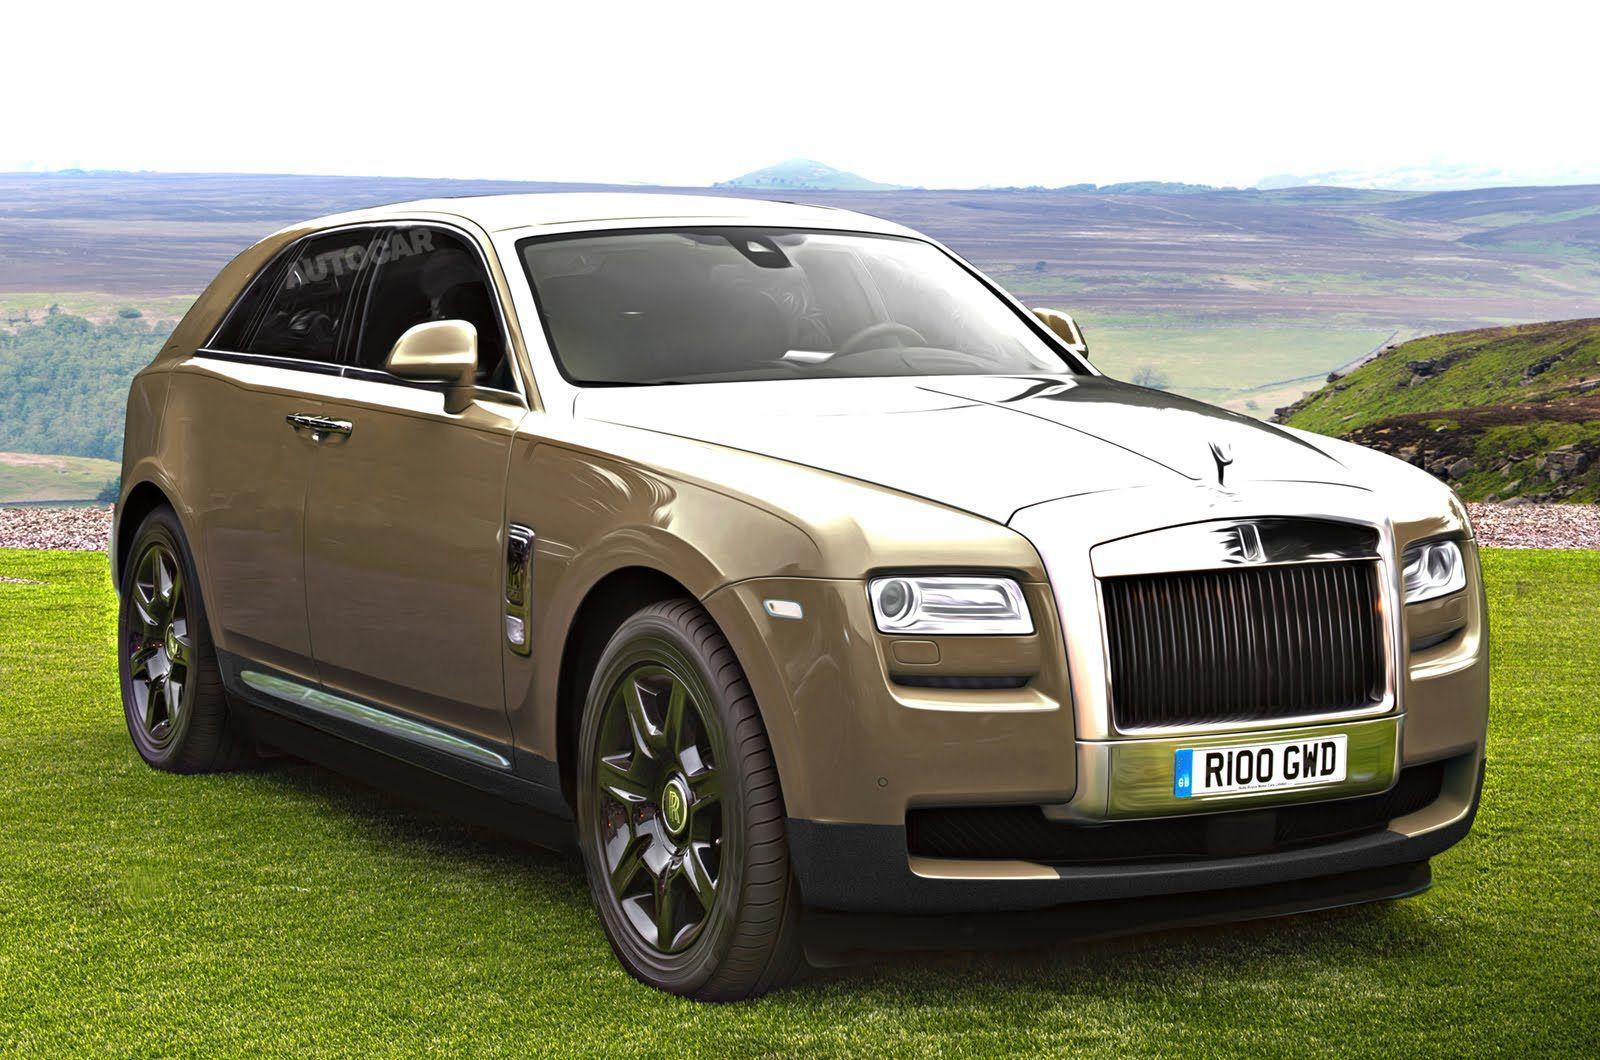 Rolls Royce Cullinan Wallpapers Wallpaper Cave